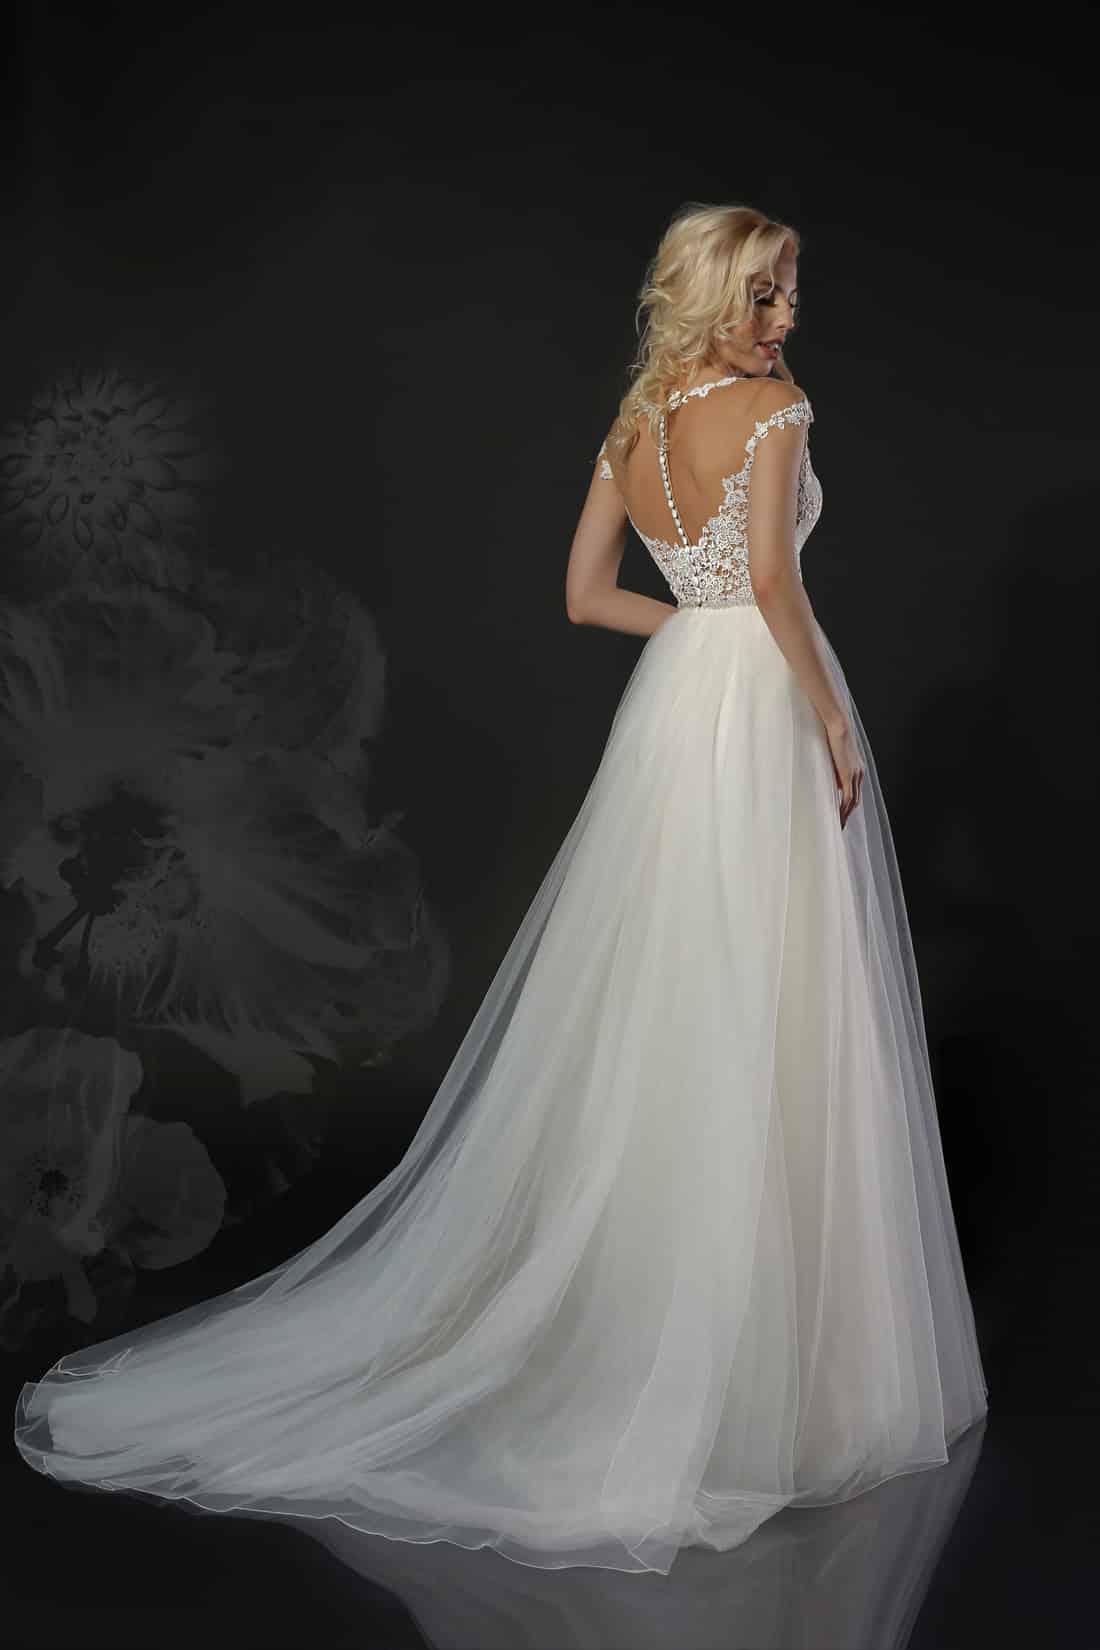 Corona- Colectia Feeria - Adora Sposa